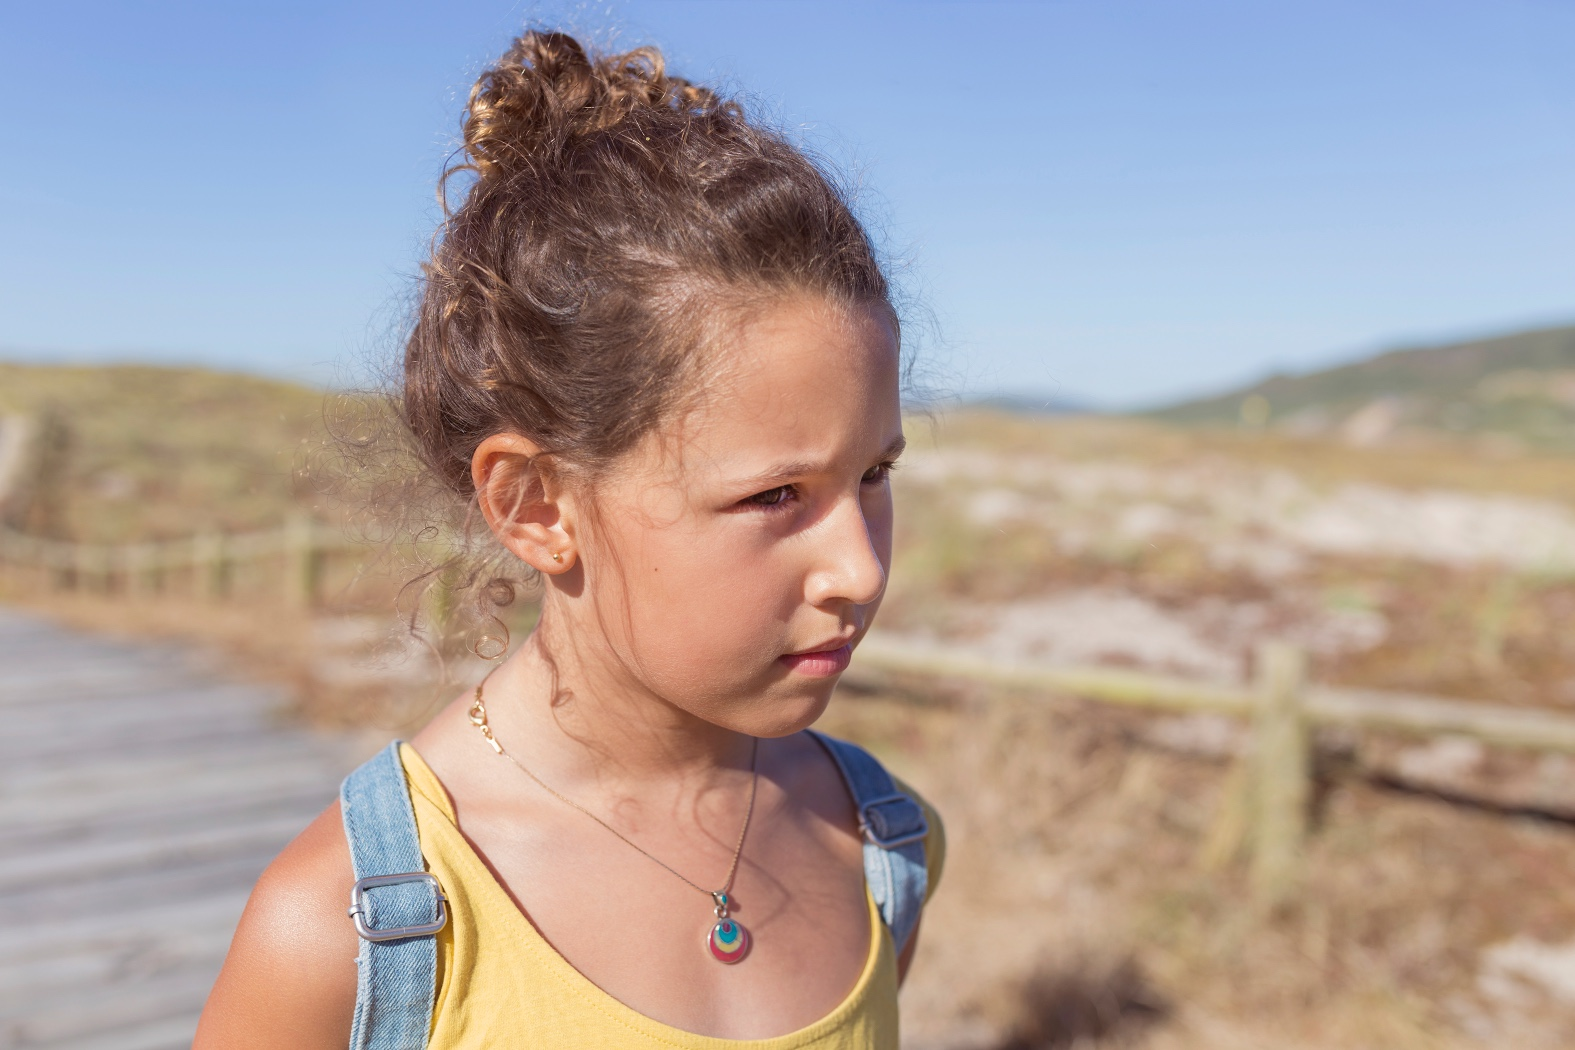 niños-moda-backpack-barrañán -coruña - descalzaporelparque - jimena -kids - playa -rojo -summer - zara kids-surf-playa-barrañan-arteixo